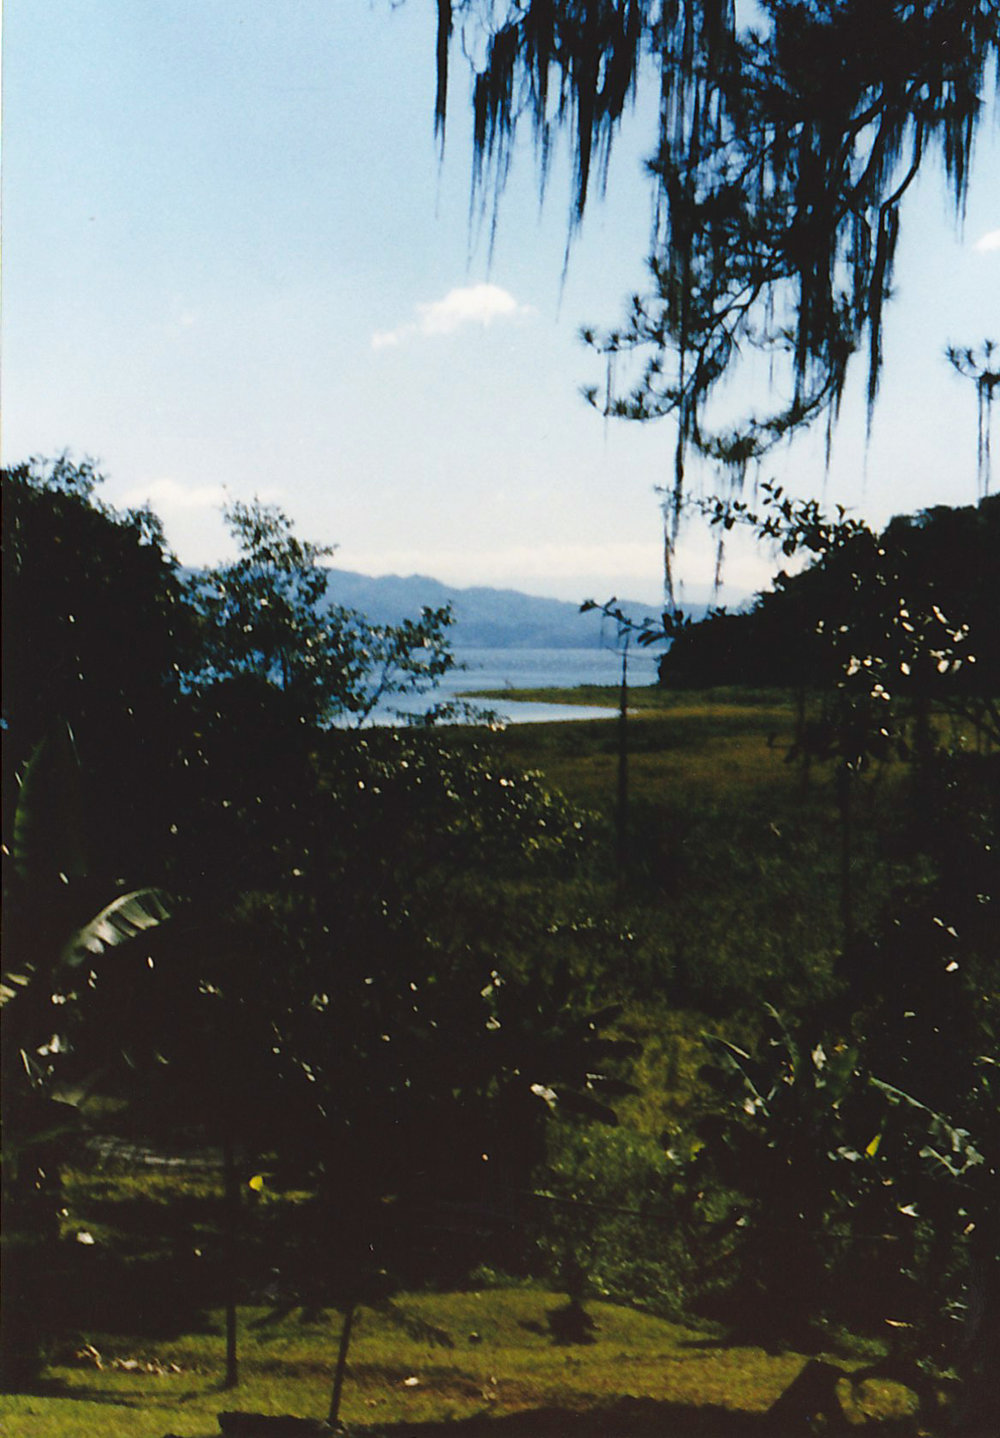 Lake-Yohoa-17.jpg